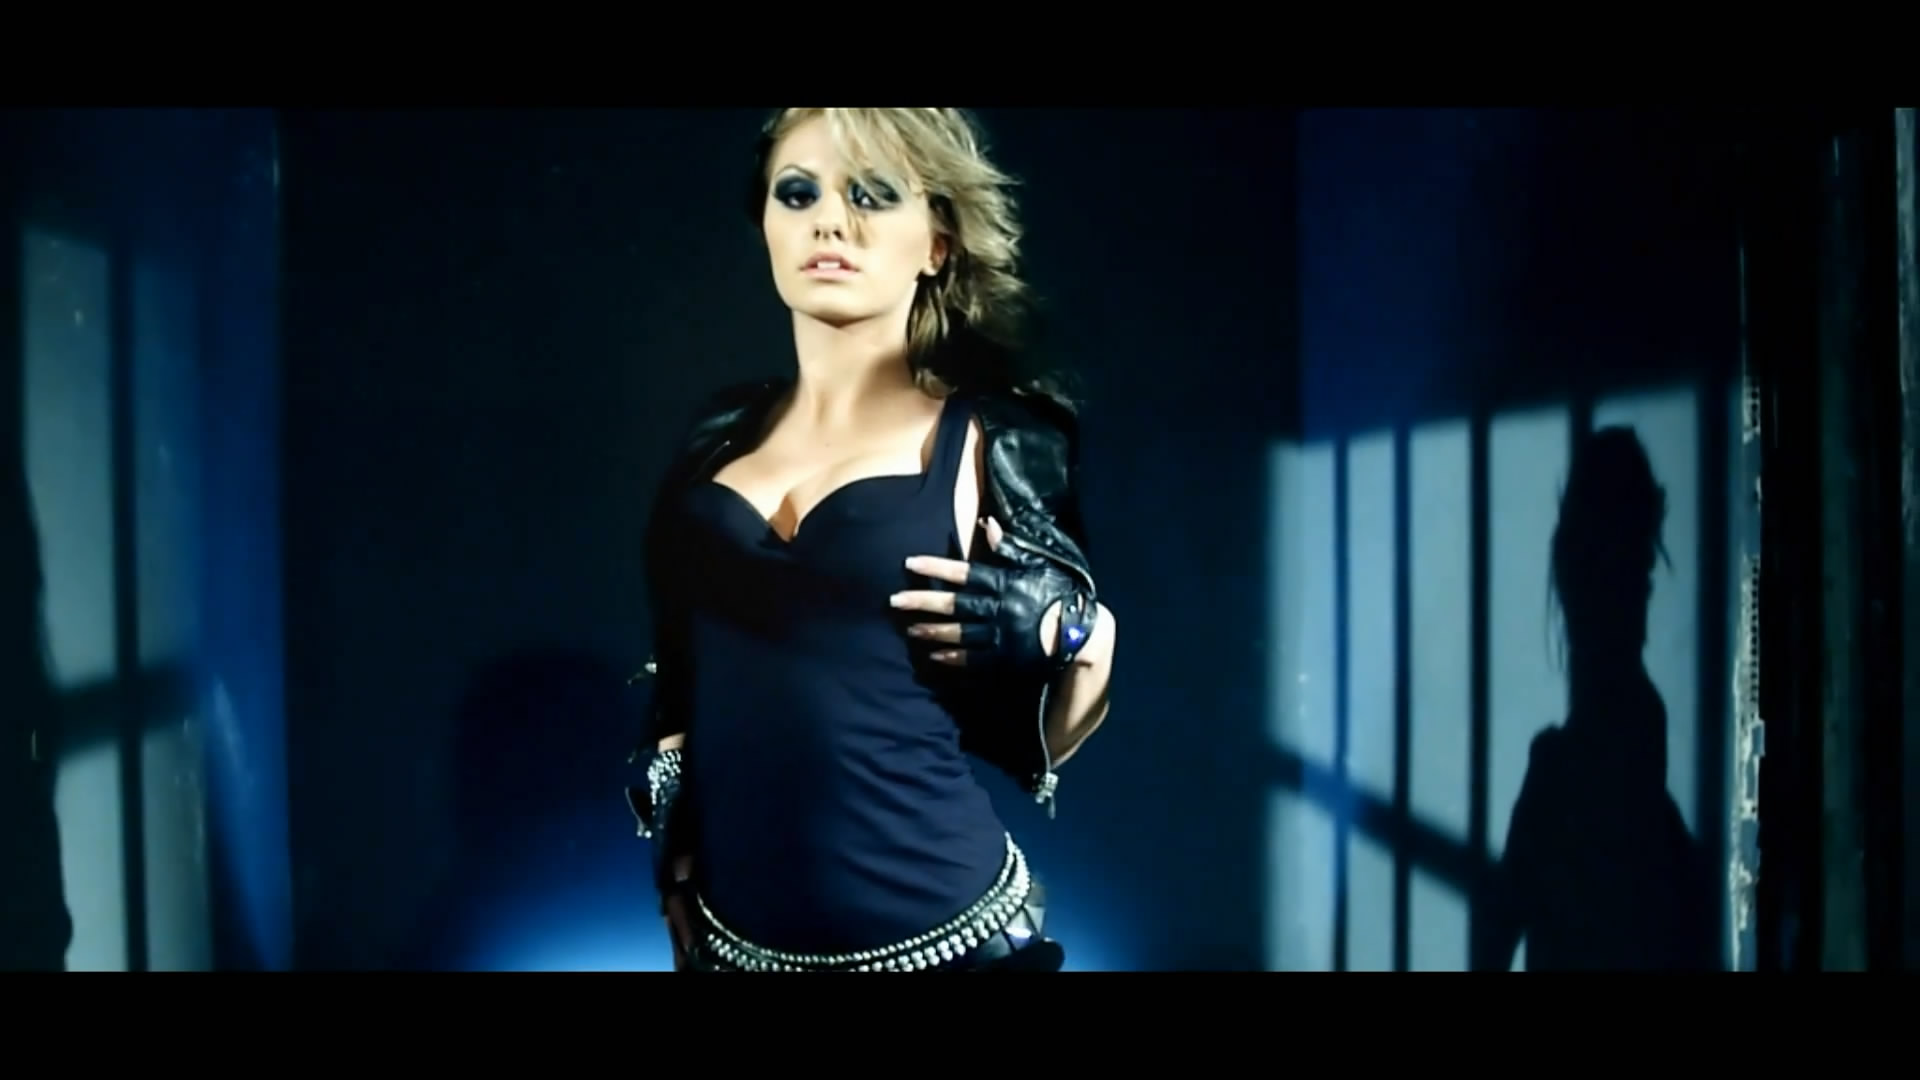 Новый клип Alexandra Stan - Mr Saxobeat (2010)